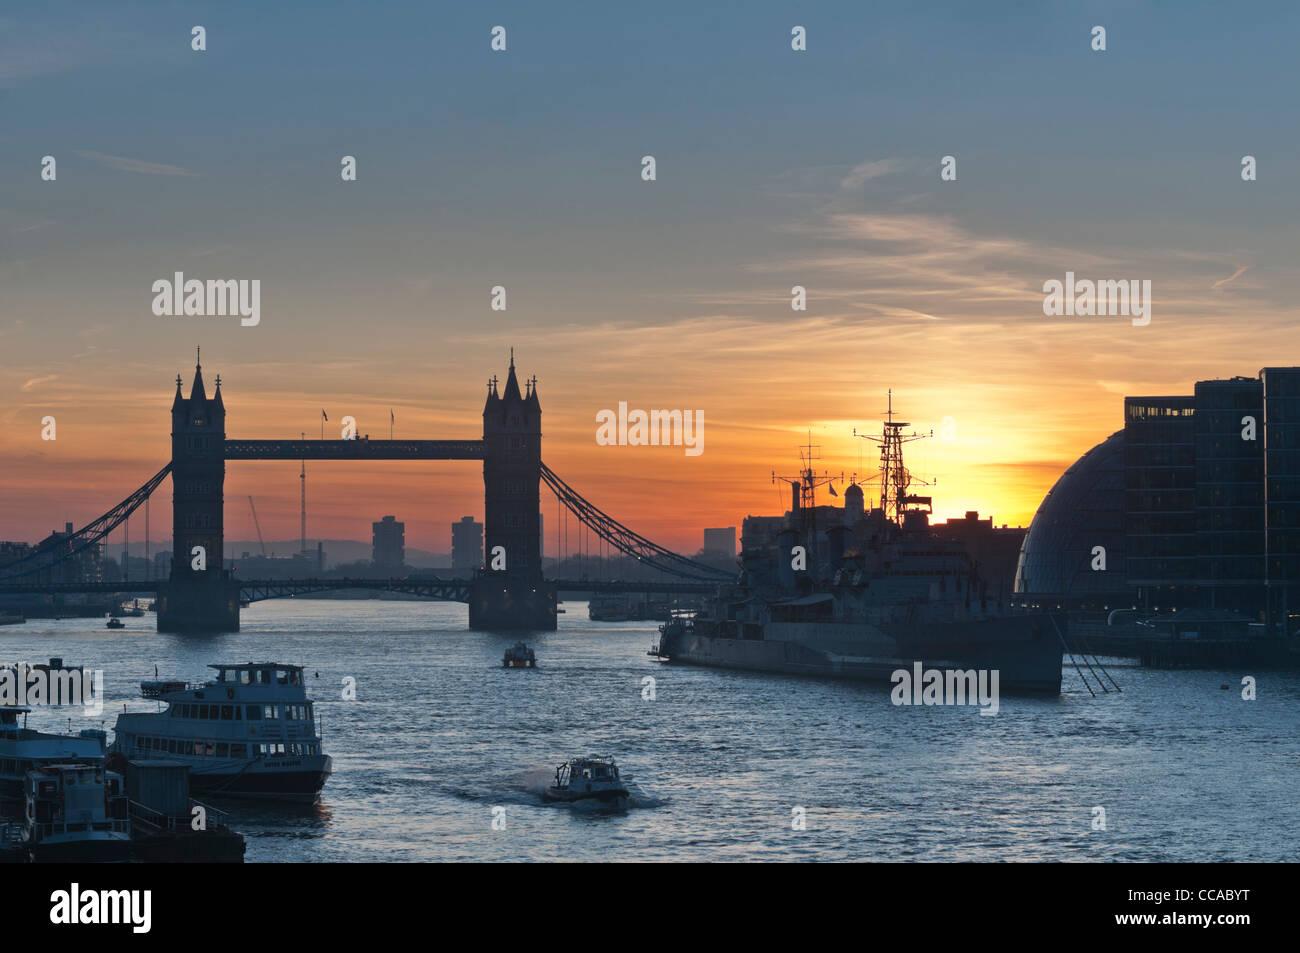 Tower bridge and HMS Belfast at dawn. London UK - Stock Image